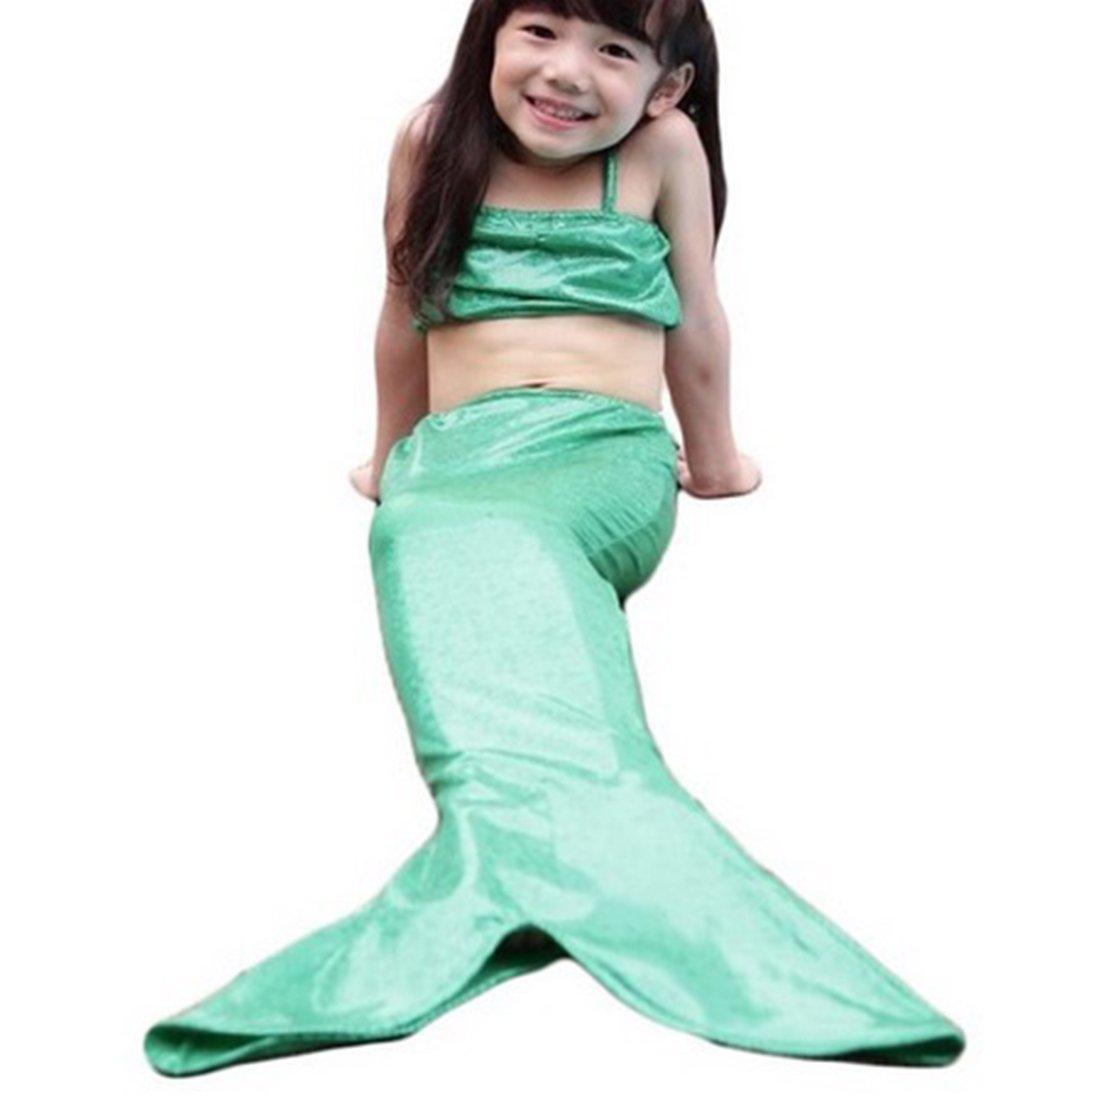 Girls 3pcs Swimmable Mermaid Tail Princess Bikini Bathing Wear Swimwear Swimsuit(size:4-5years Old) Neal LINK(TM)